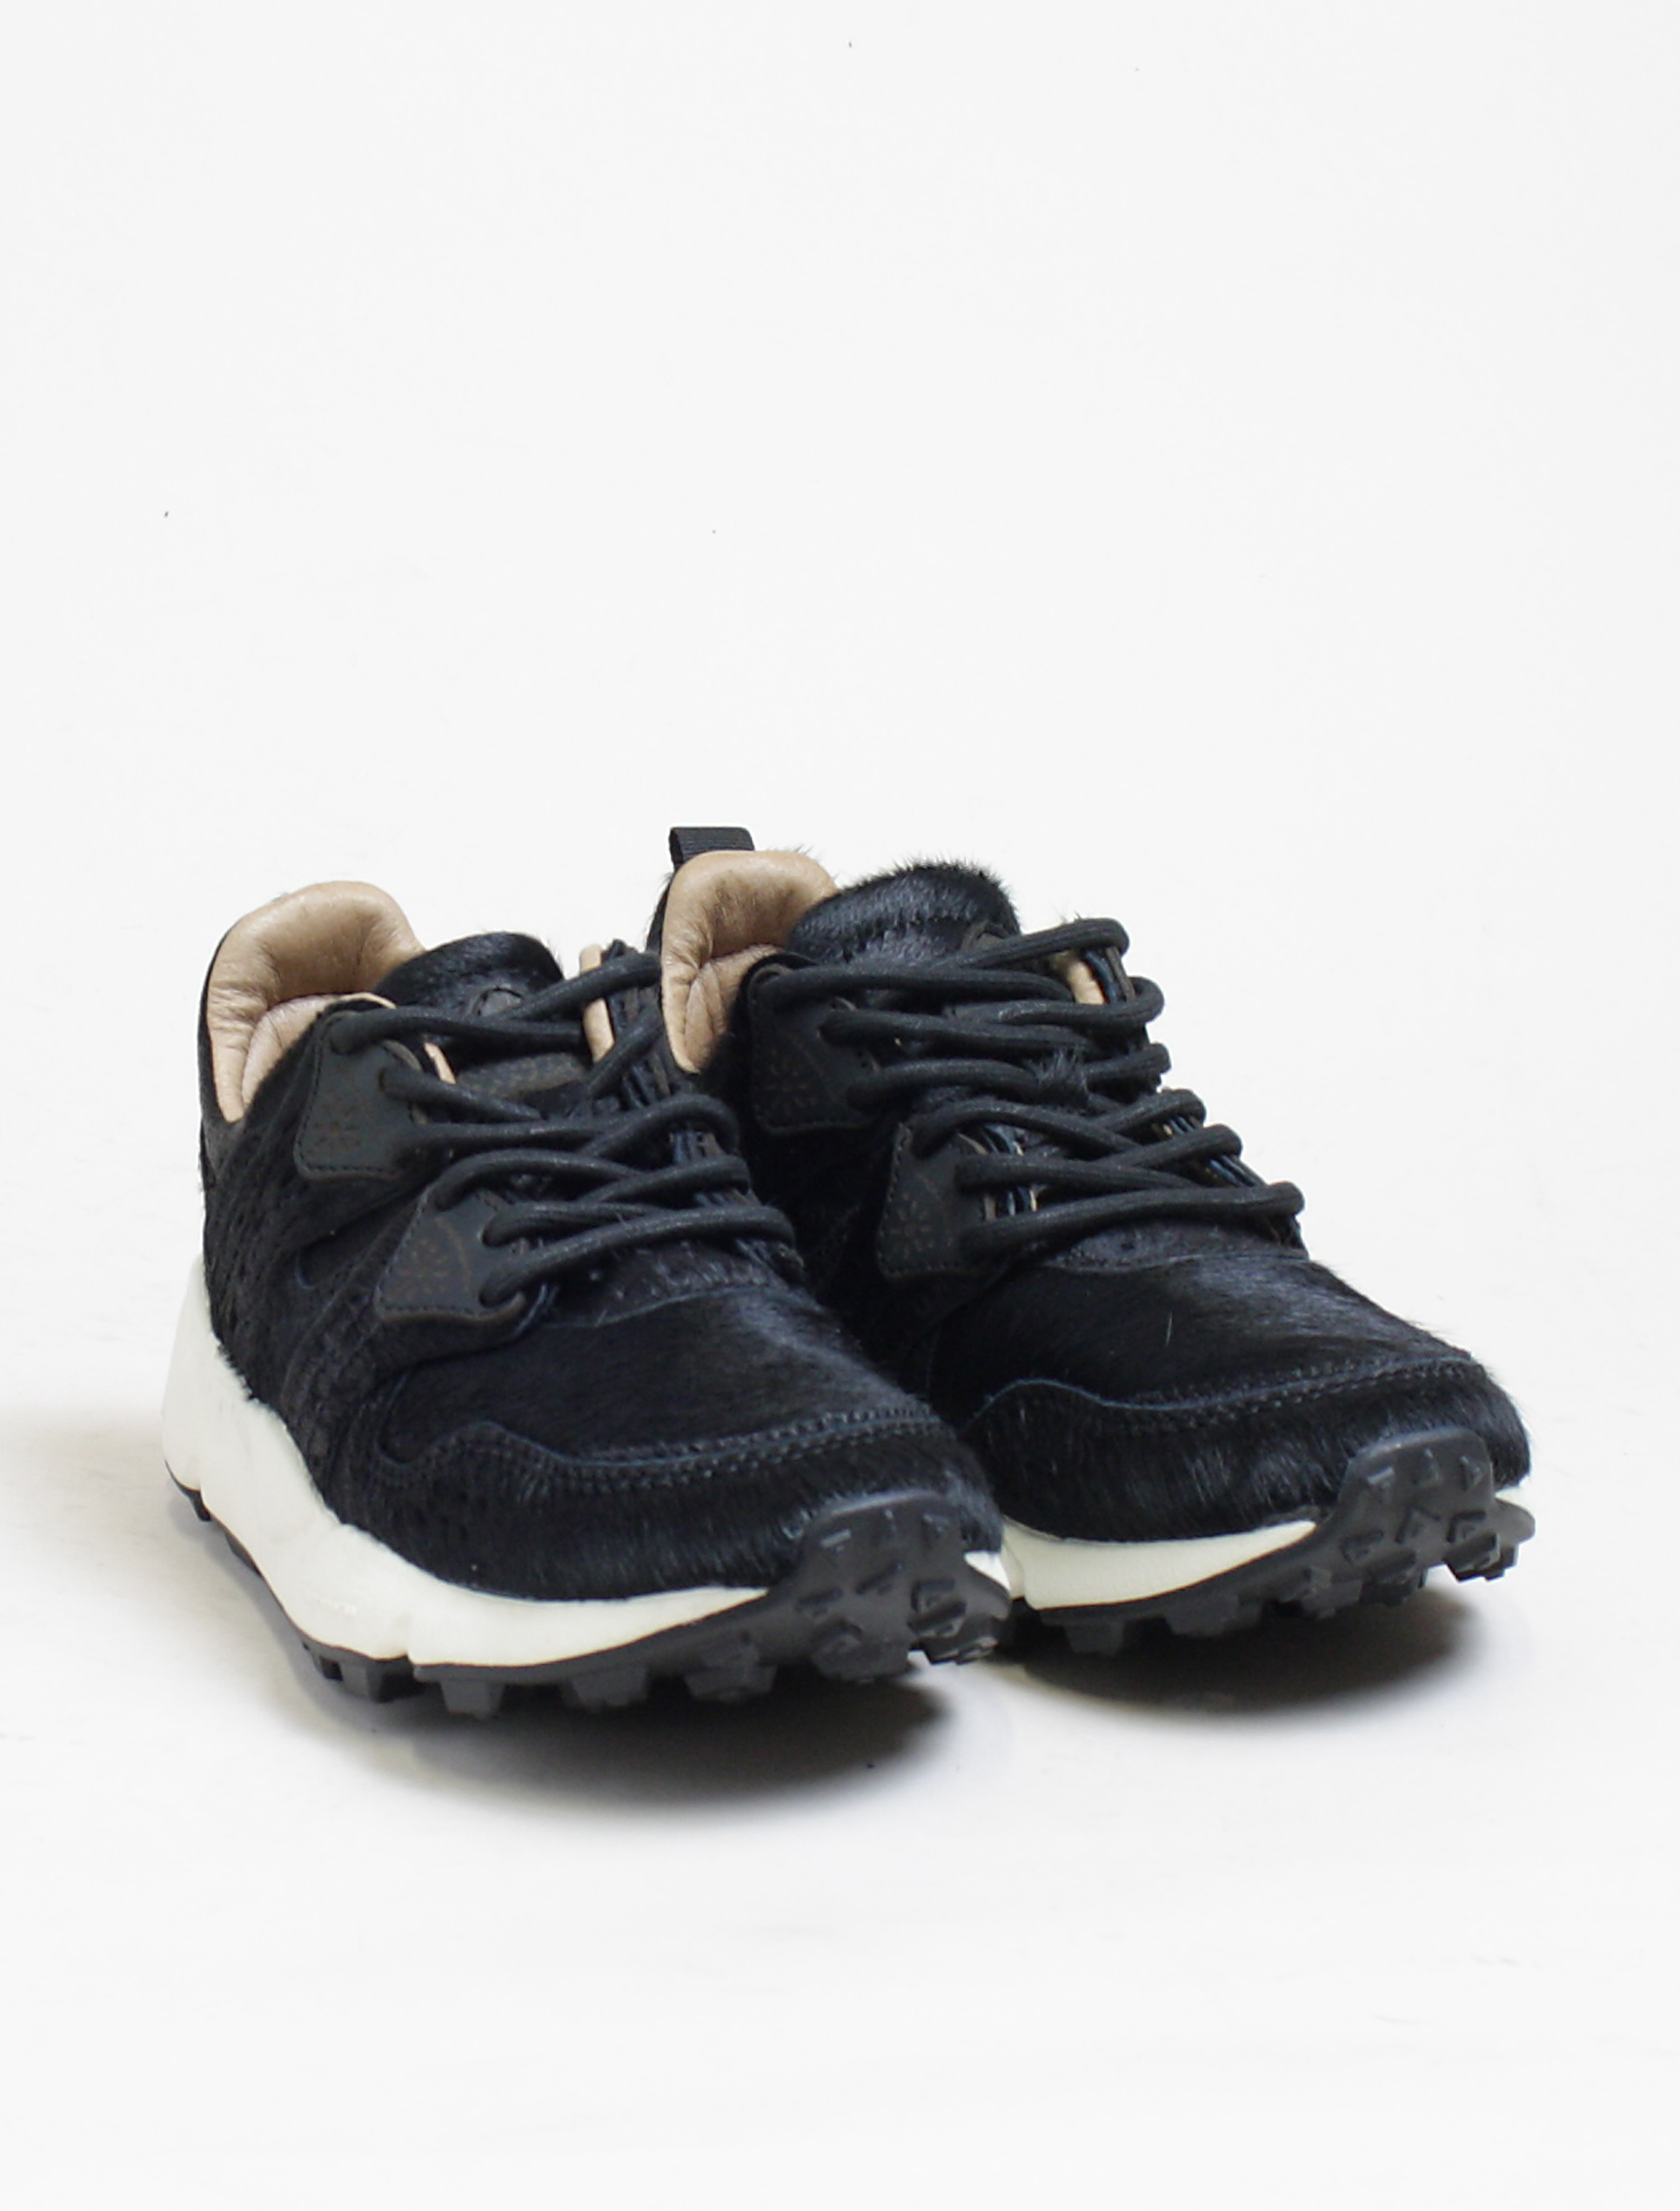 Flower Mountain sneakers Corax 2 horse hair black paio